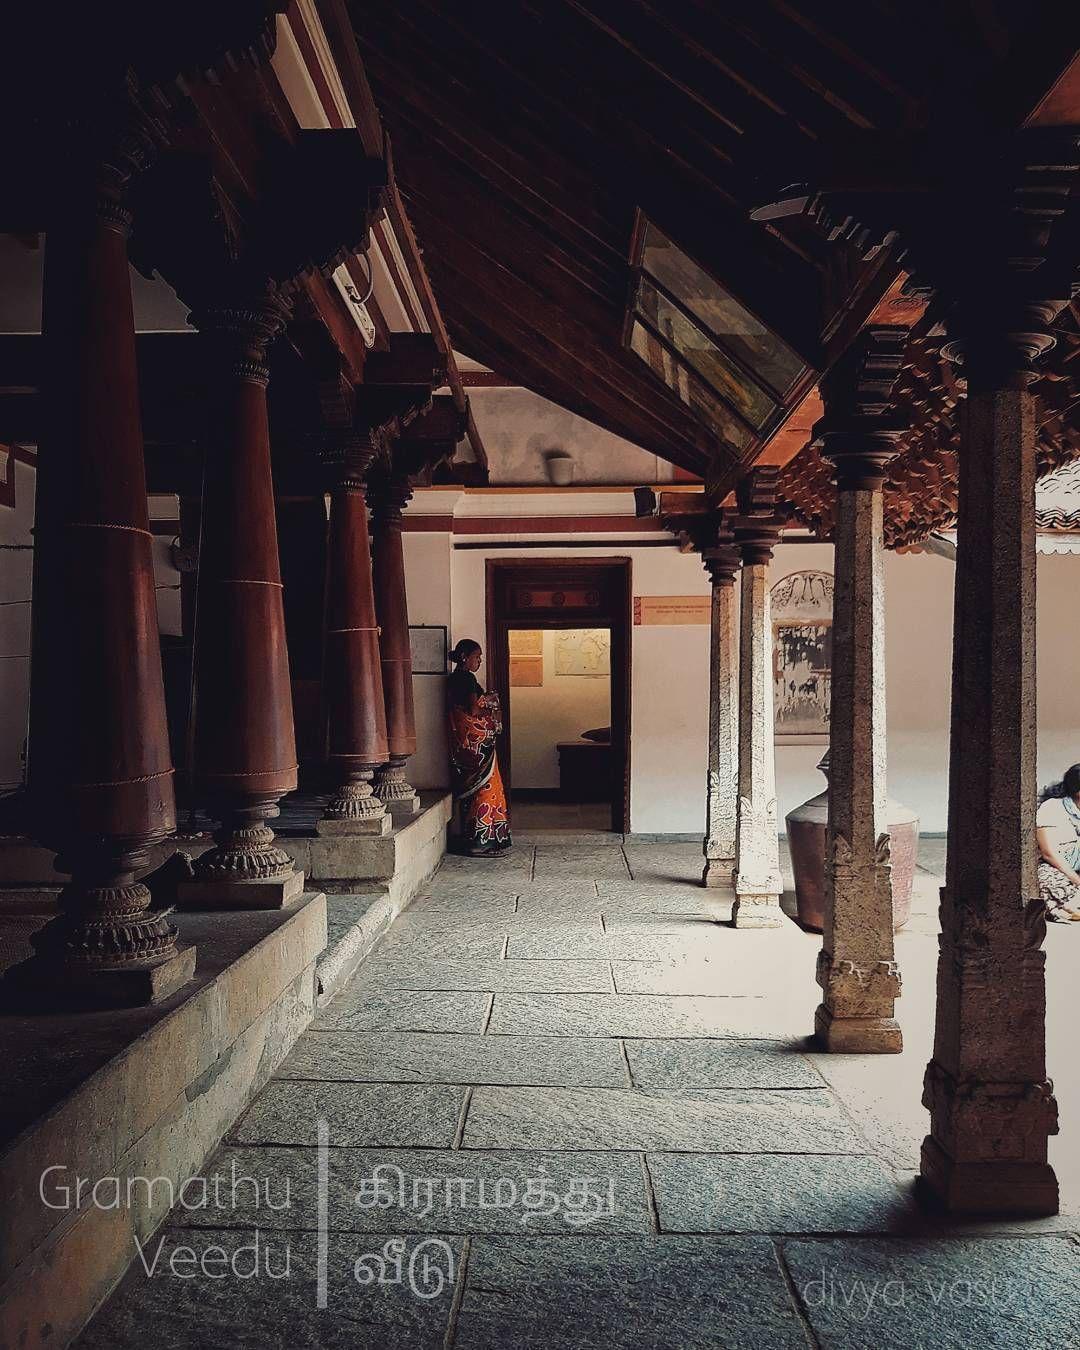 Temple Texas Traditional Home: Divya Vasu (@divya_vasu) On